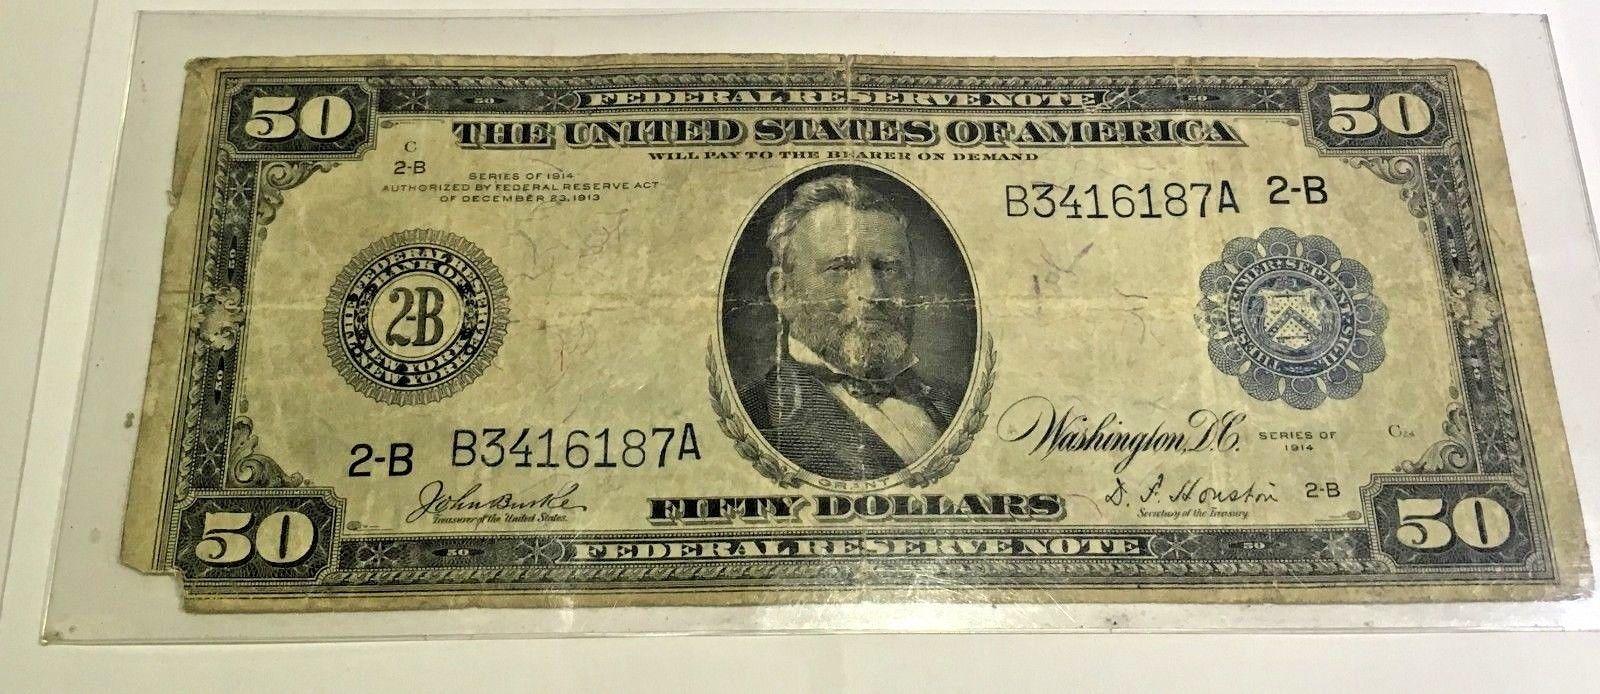 Grant Federal Reserve Note designed on Modern $2 Bill 1914 Series $50 Ulysses S